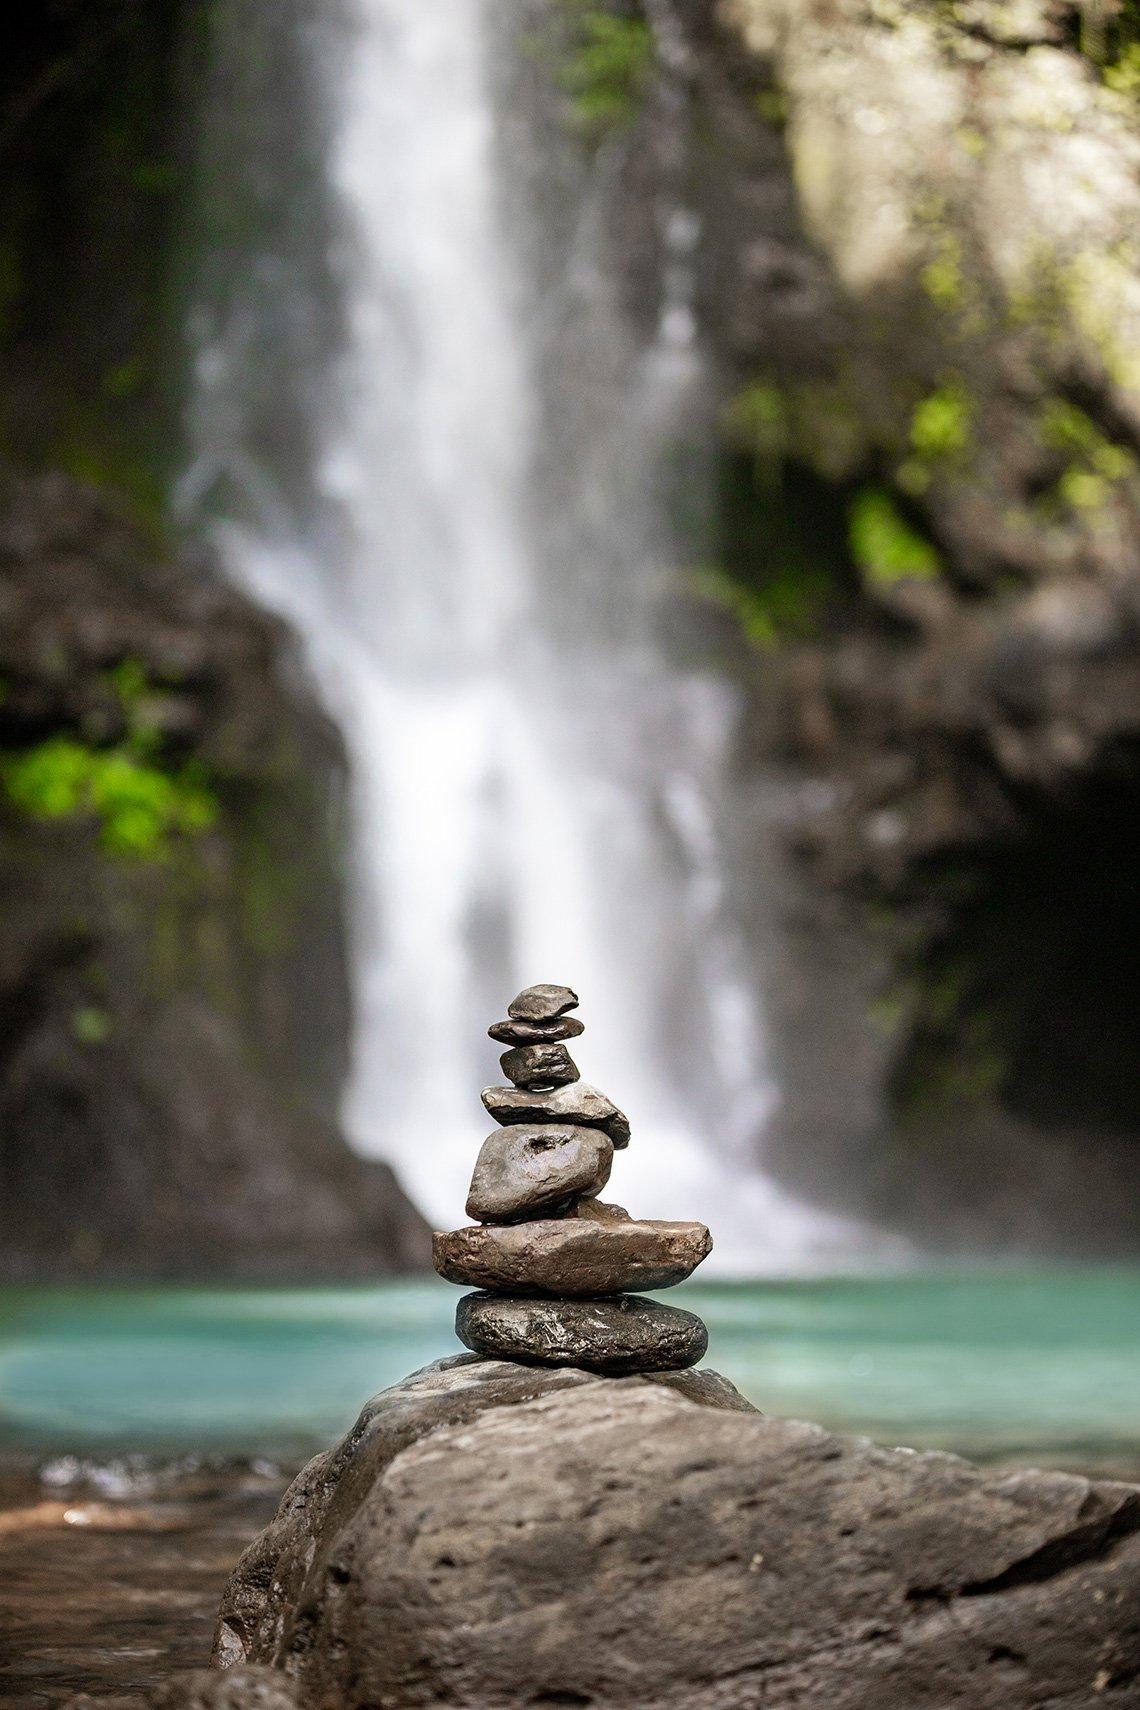 Zen Waterfall Balance by Davin Phelps